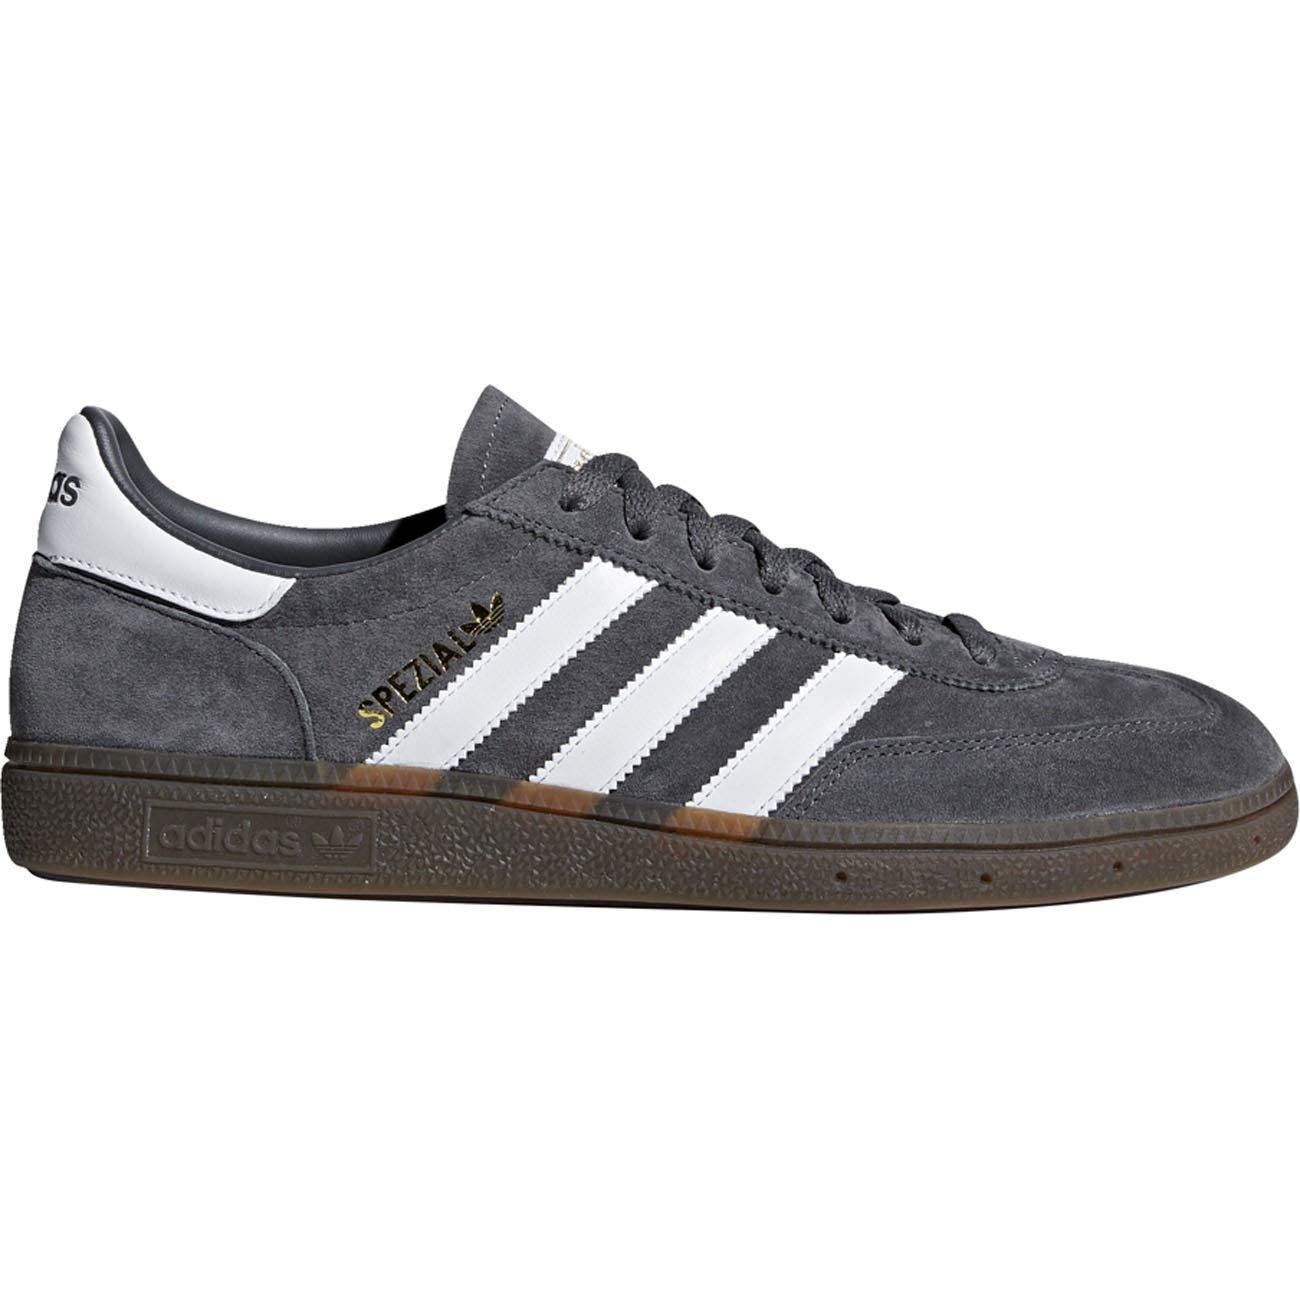 adidas Men's Handball Spezial Fitness Shoes